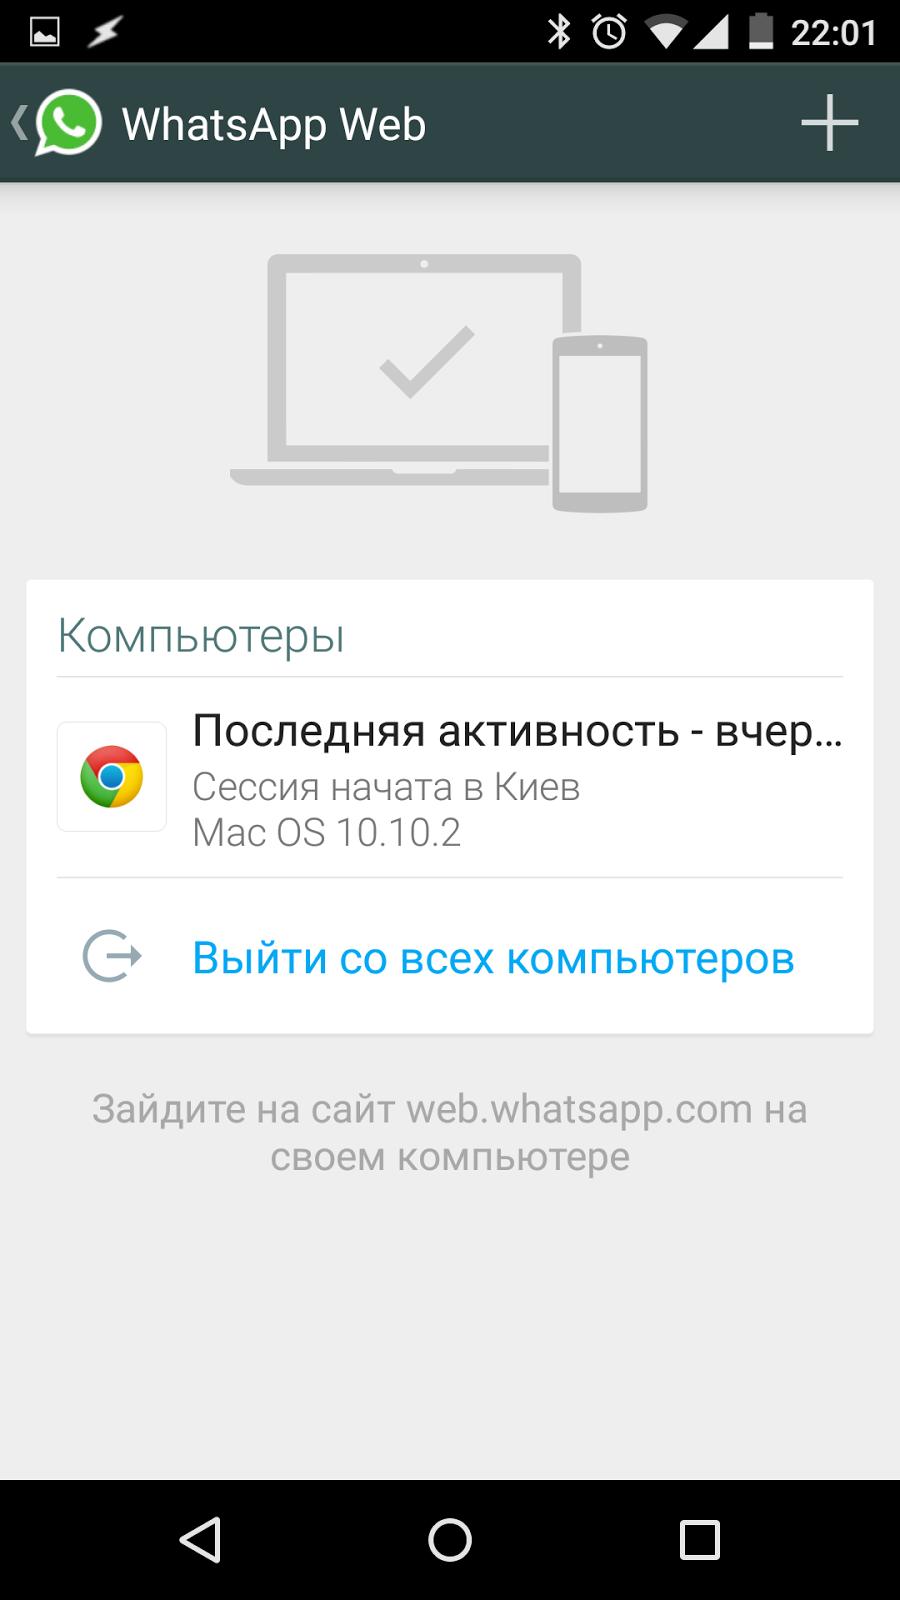 Screenshot_2015-02-20-22-01-34